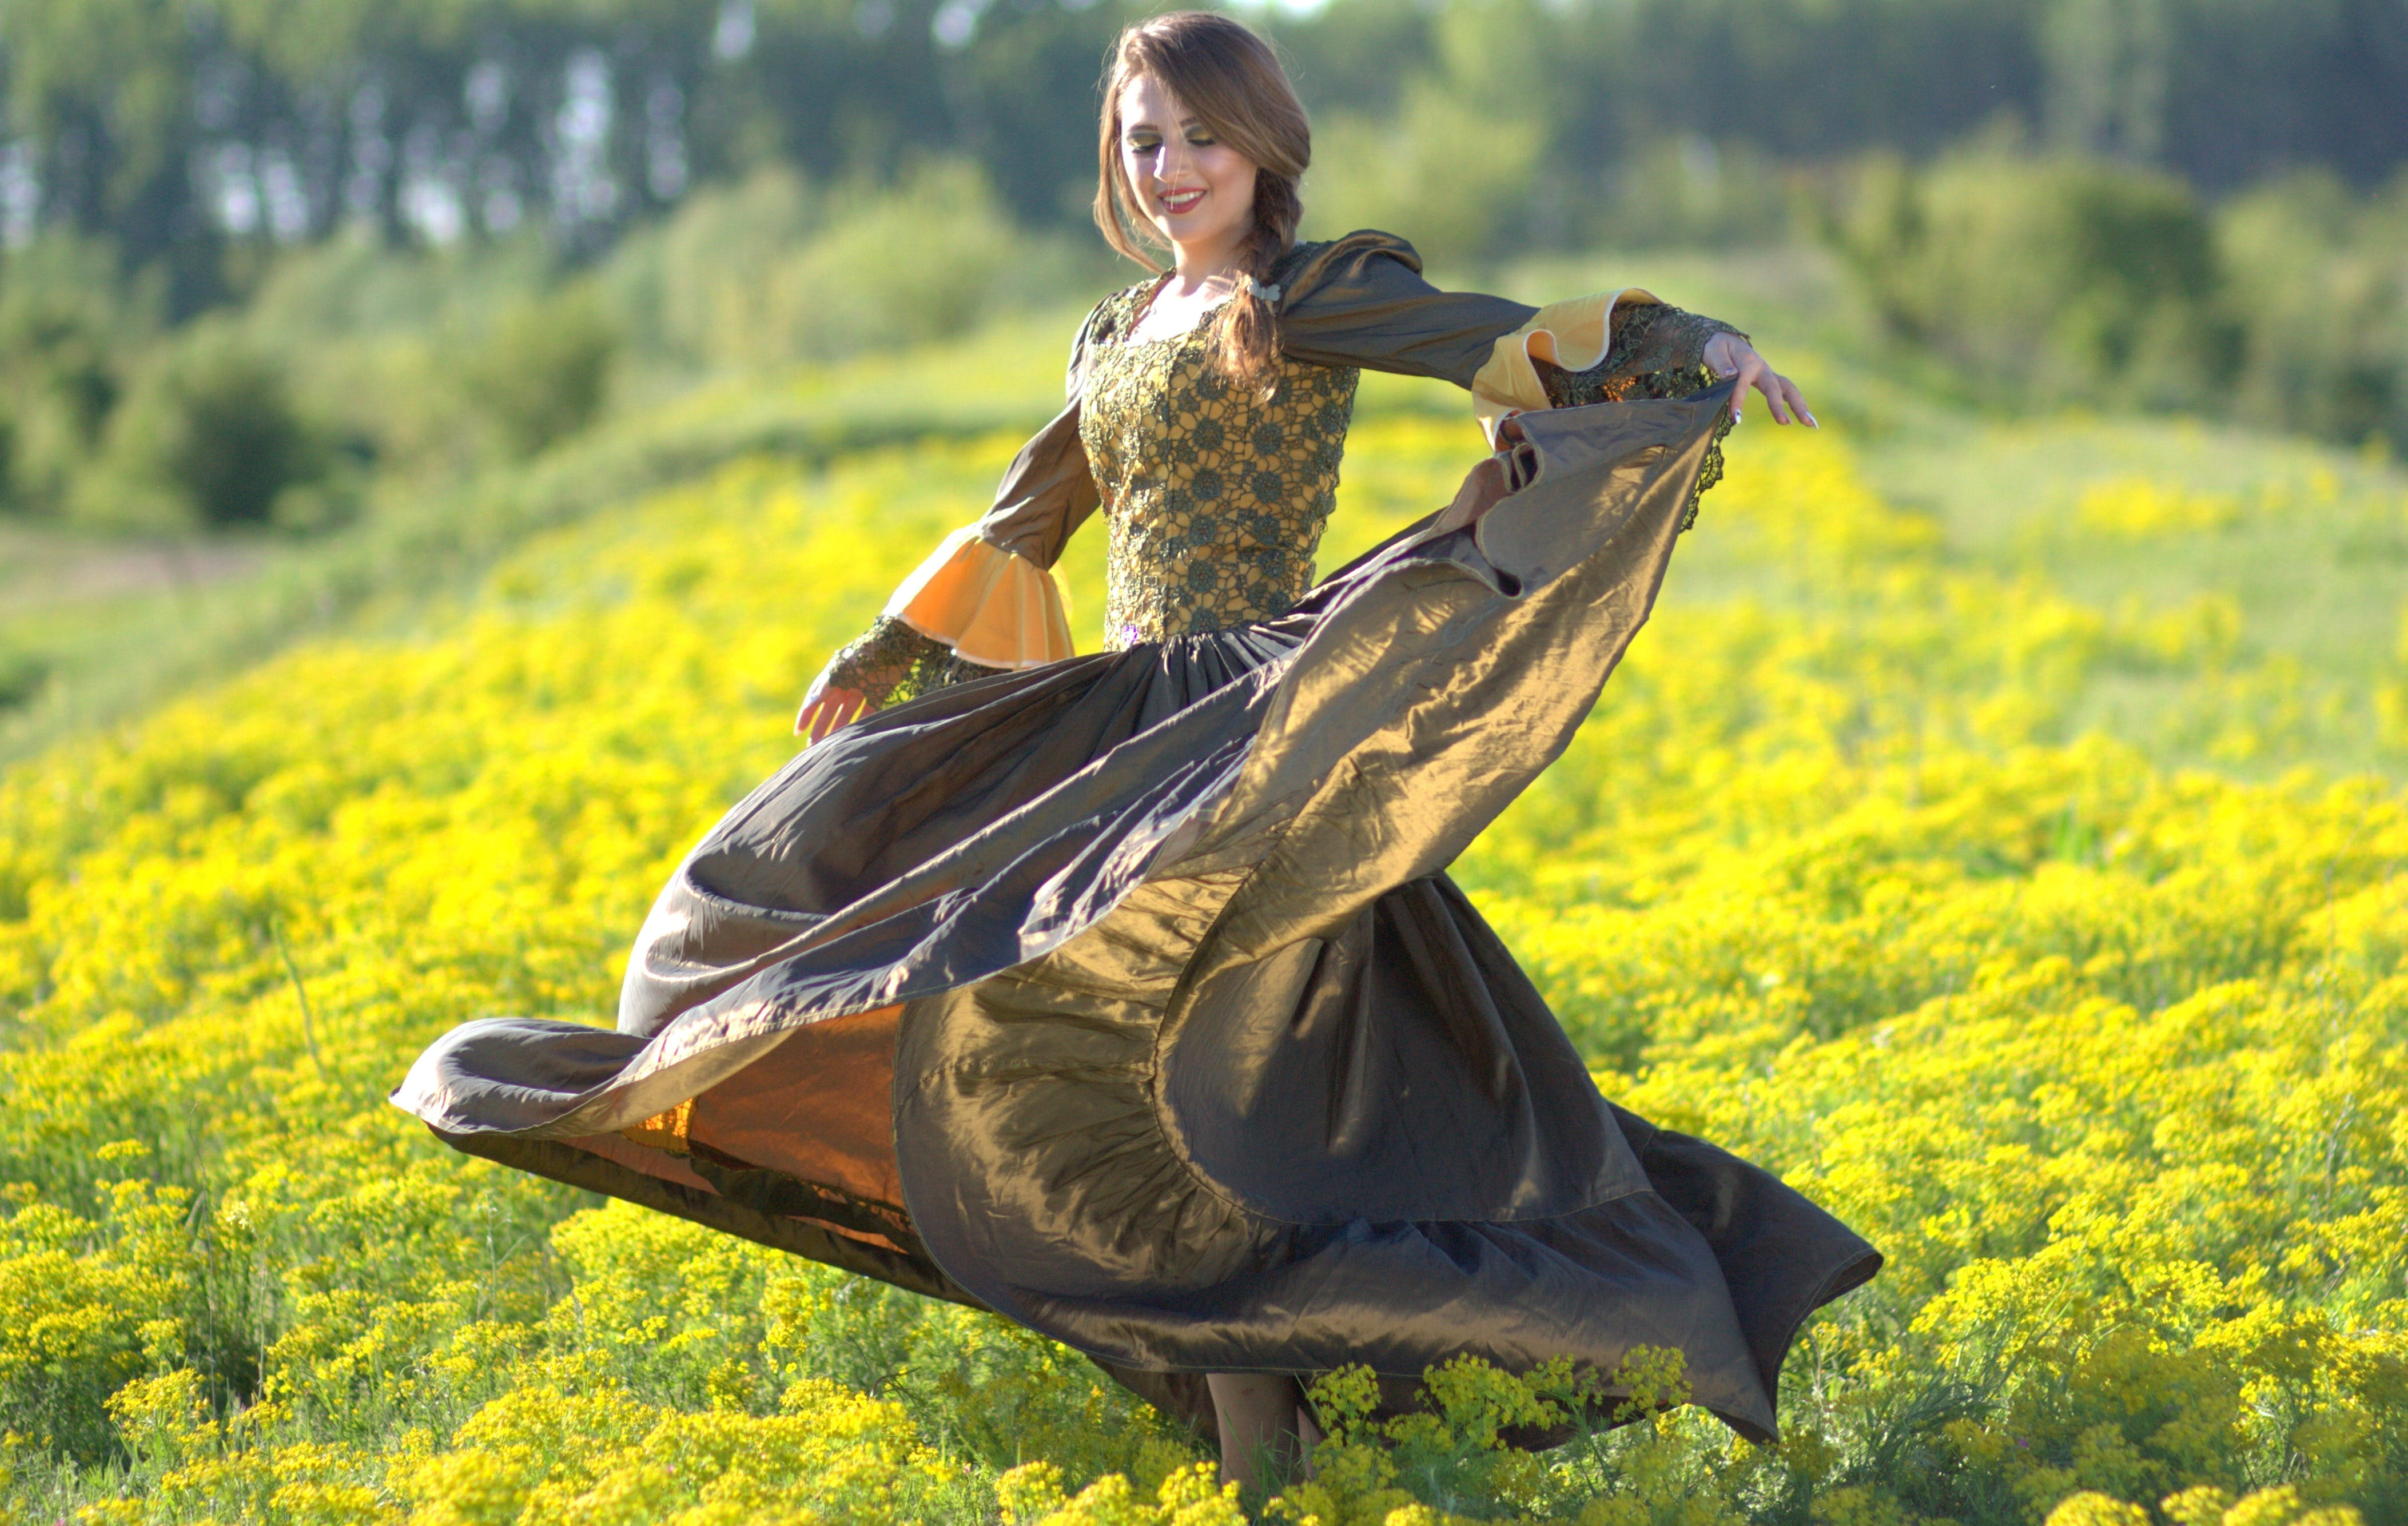 Woman on Princess Costume Waving Her Dress on Green Flower Fields